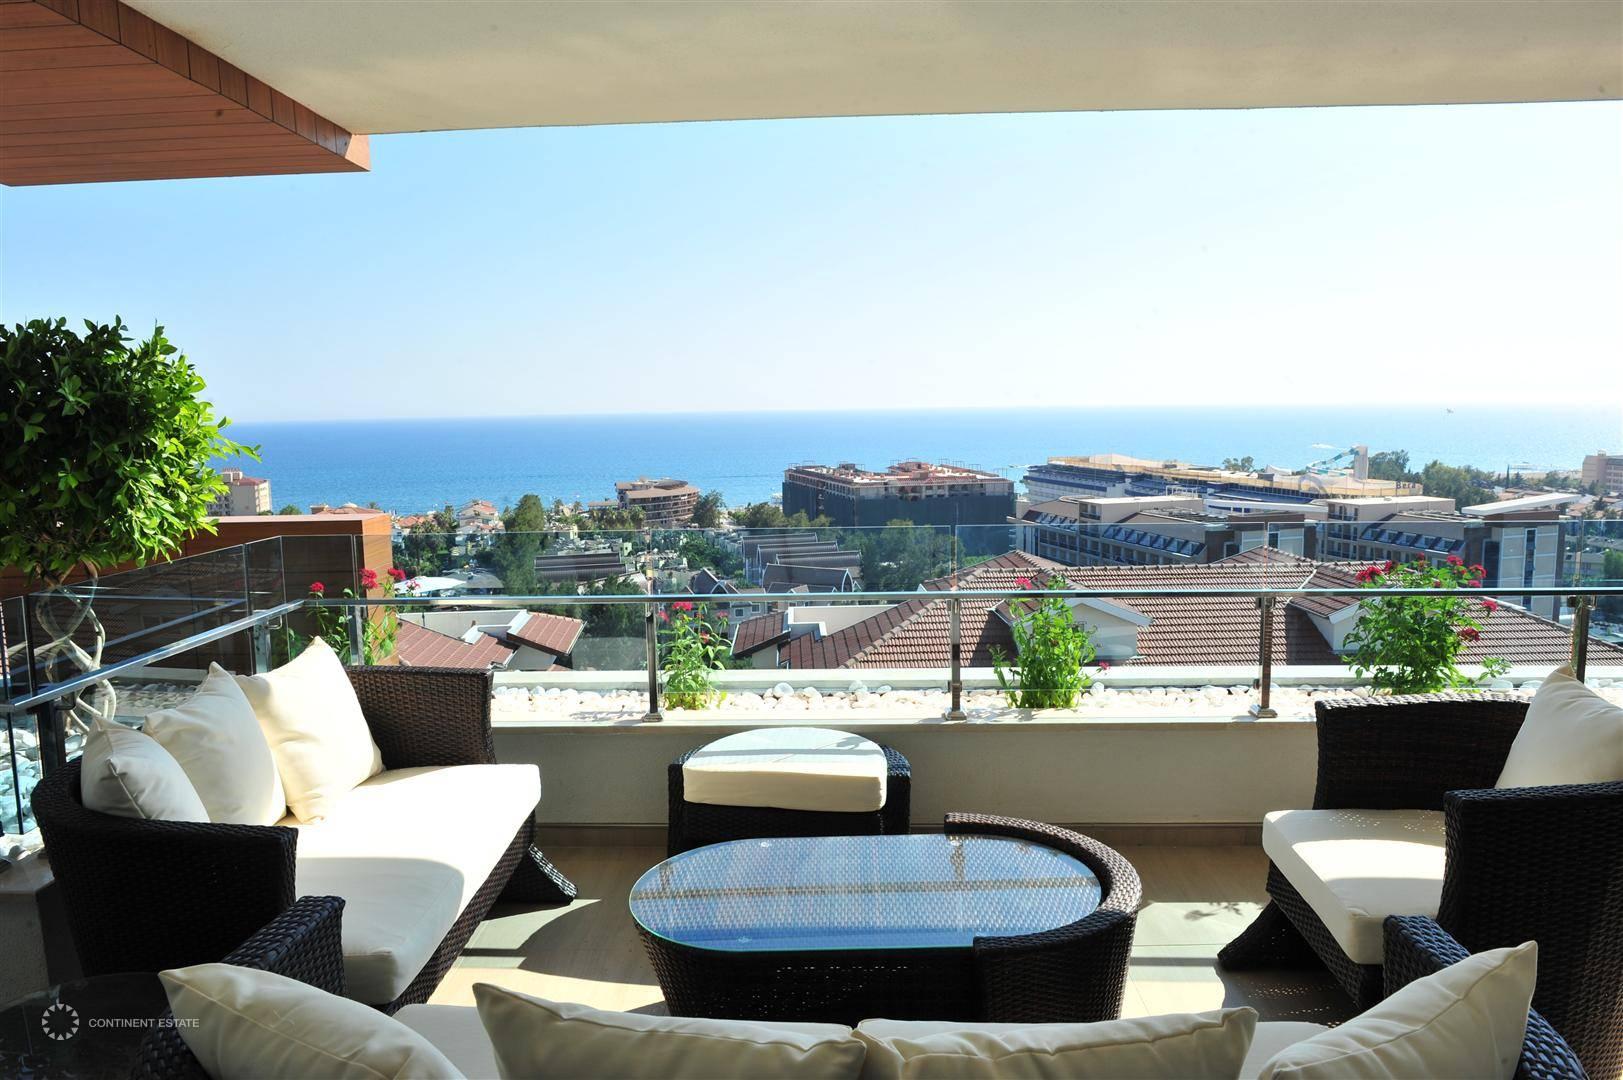 Квартира в Турции, Алания, Конаклы (Анталия) — недвижимость за рубежом:  объект № CEI65616